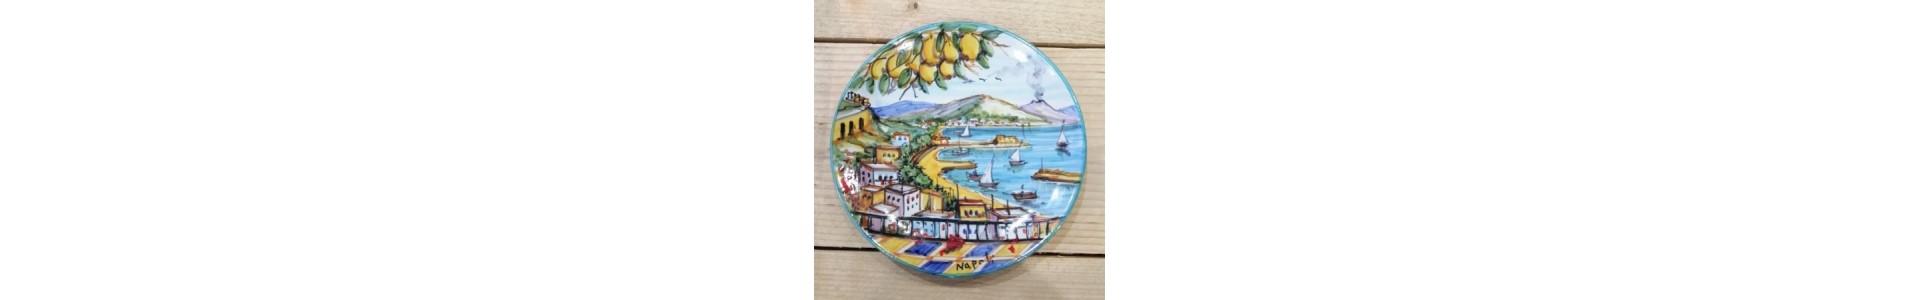 paesaggi Napoli